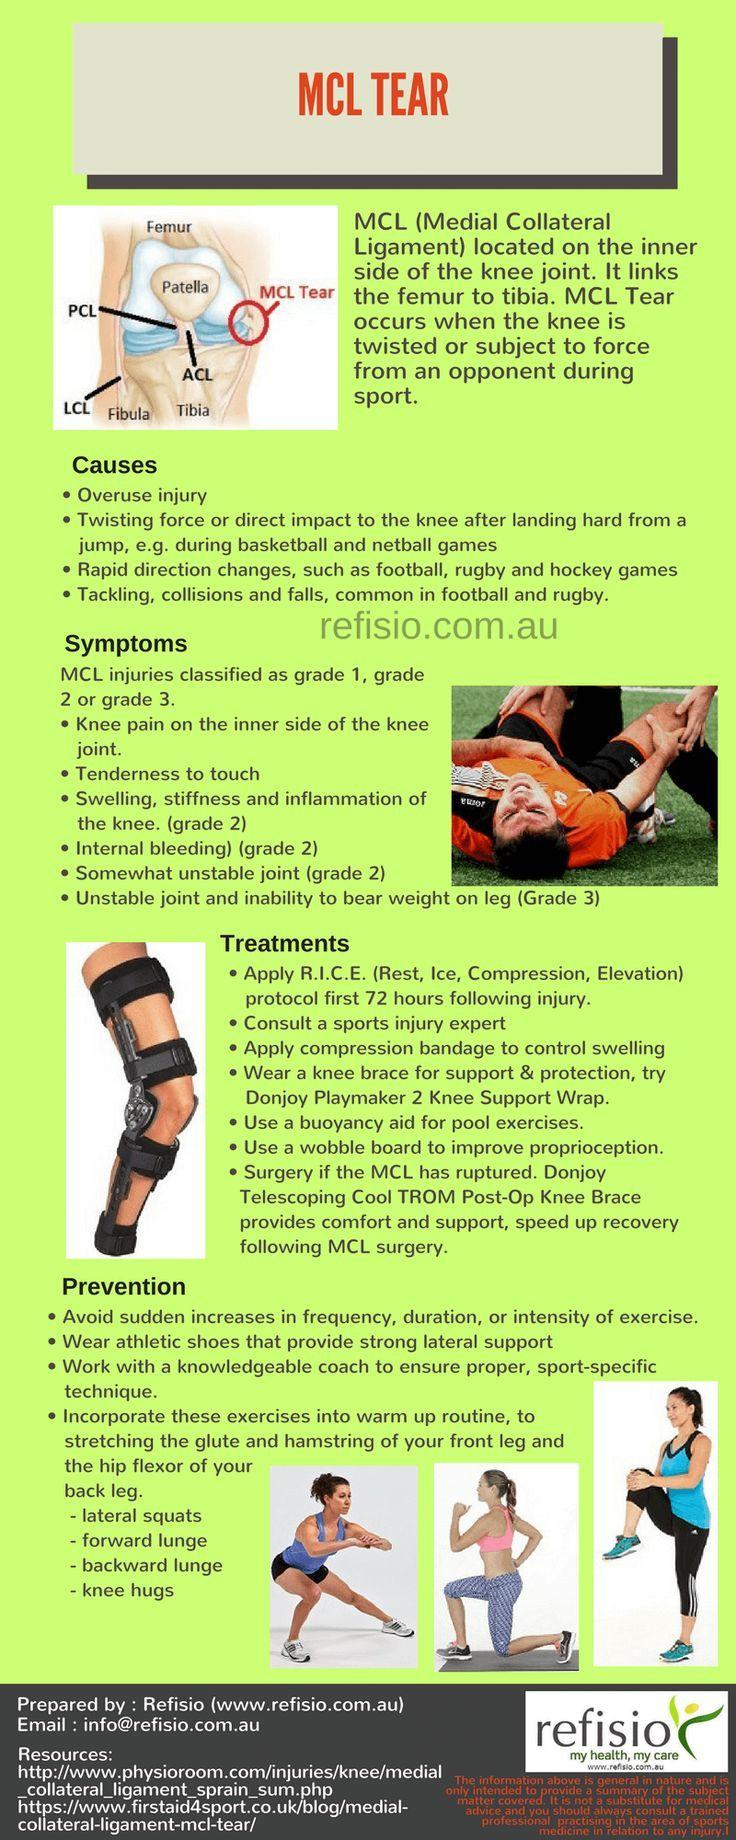 Grade 2 mcl sprain symptoms - Mcl Tear Causes Symptoms Treatment Prevention